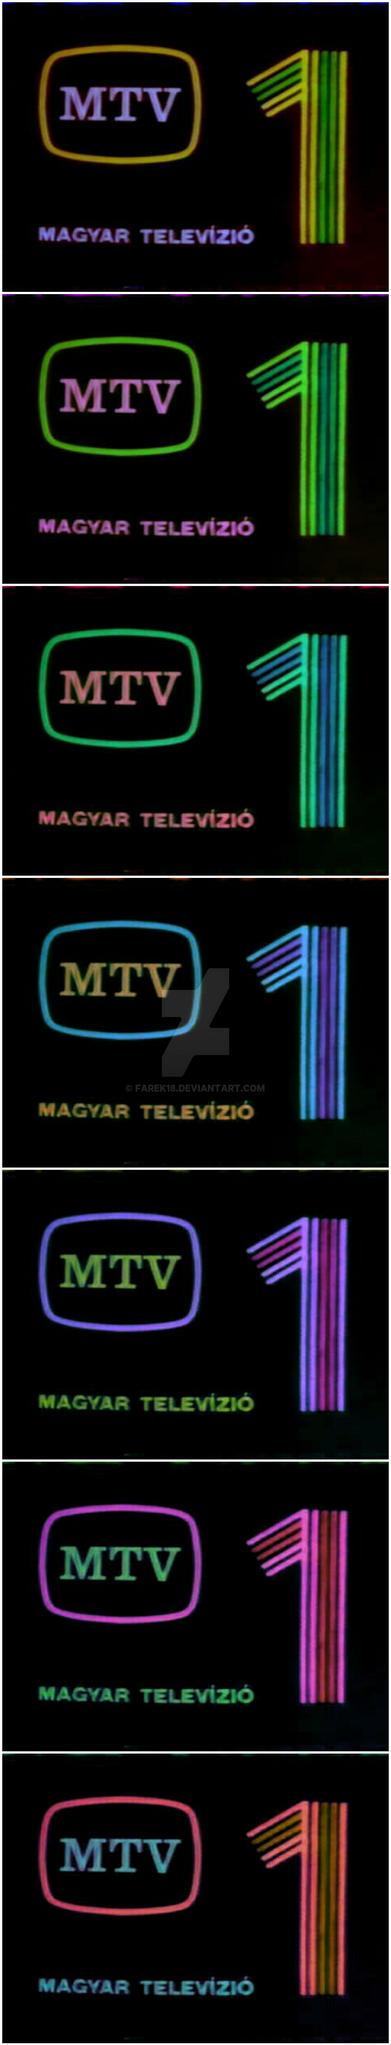 MTV 1 logo color variation #02 by farek18